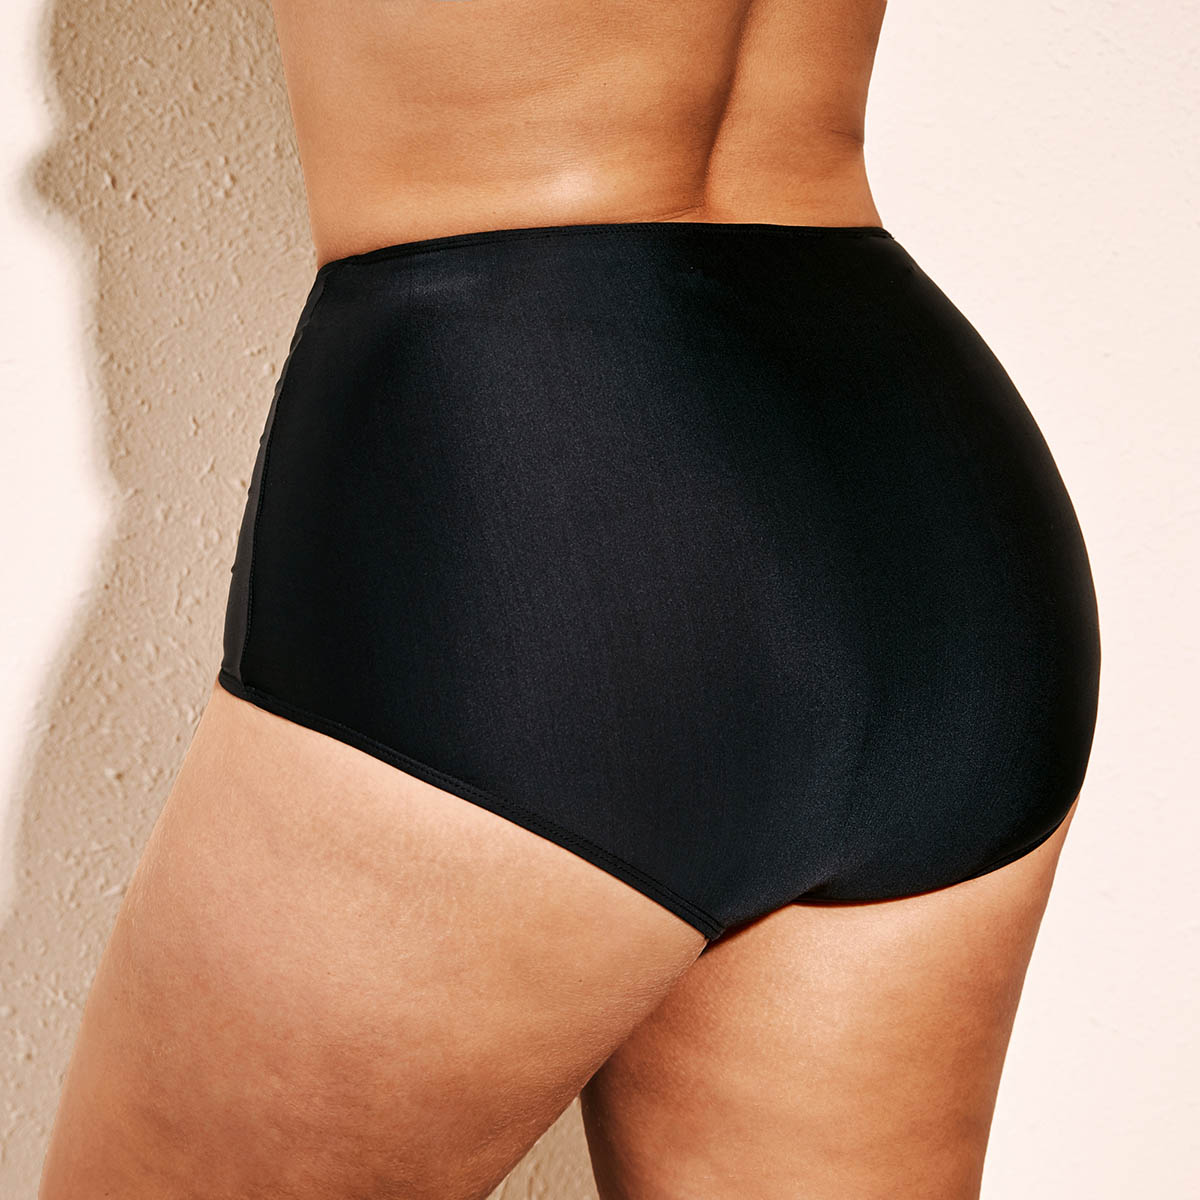 Black High Waist Plus Size Swimwear Shorts